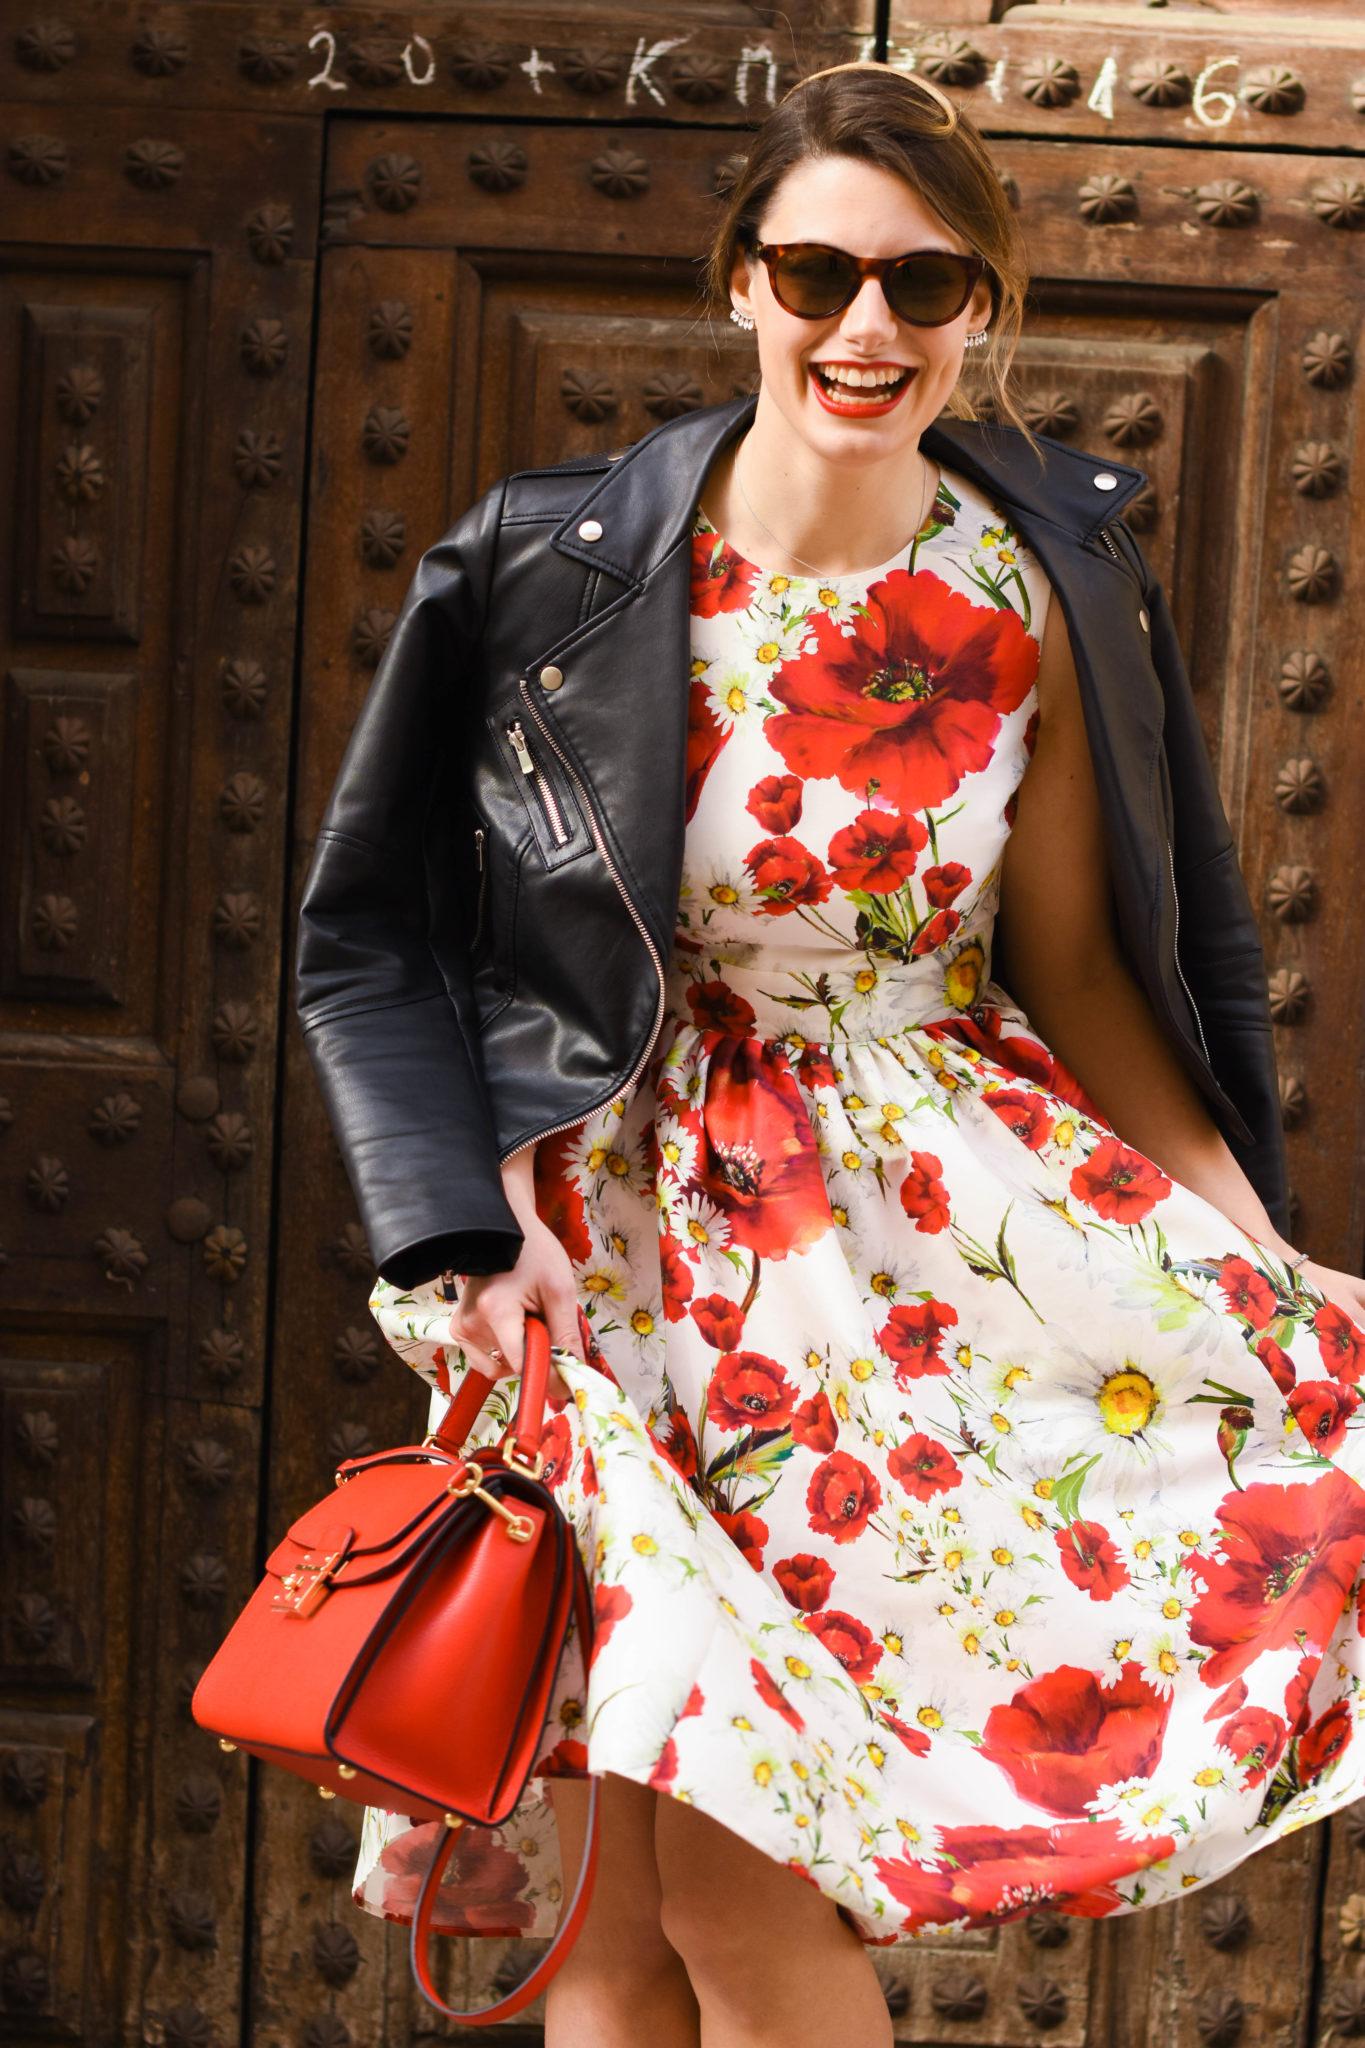 giulia-de-martin-behindmyglasses-com-sunglasses-maui-jim-eyewear-collection-dolce-gabbana-bag-dress-valentino-rockstud-pumps-red-mango-leather-jacket-7-1